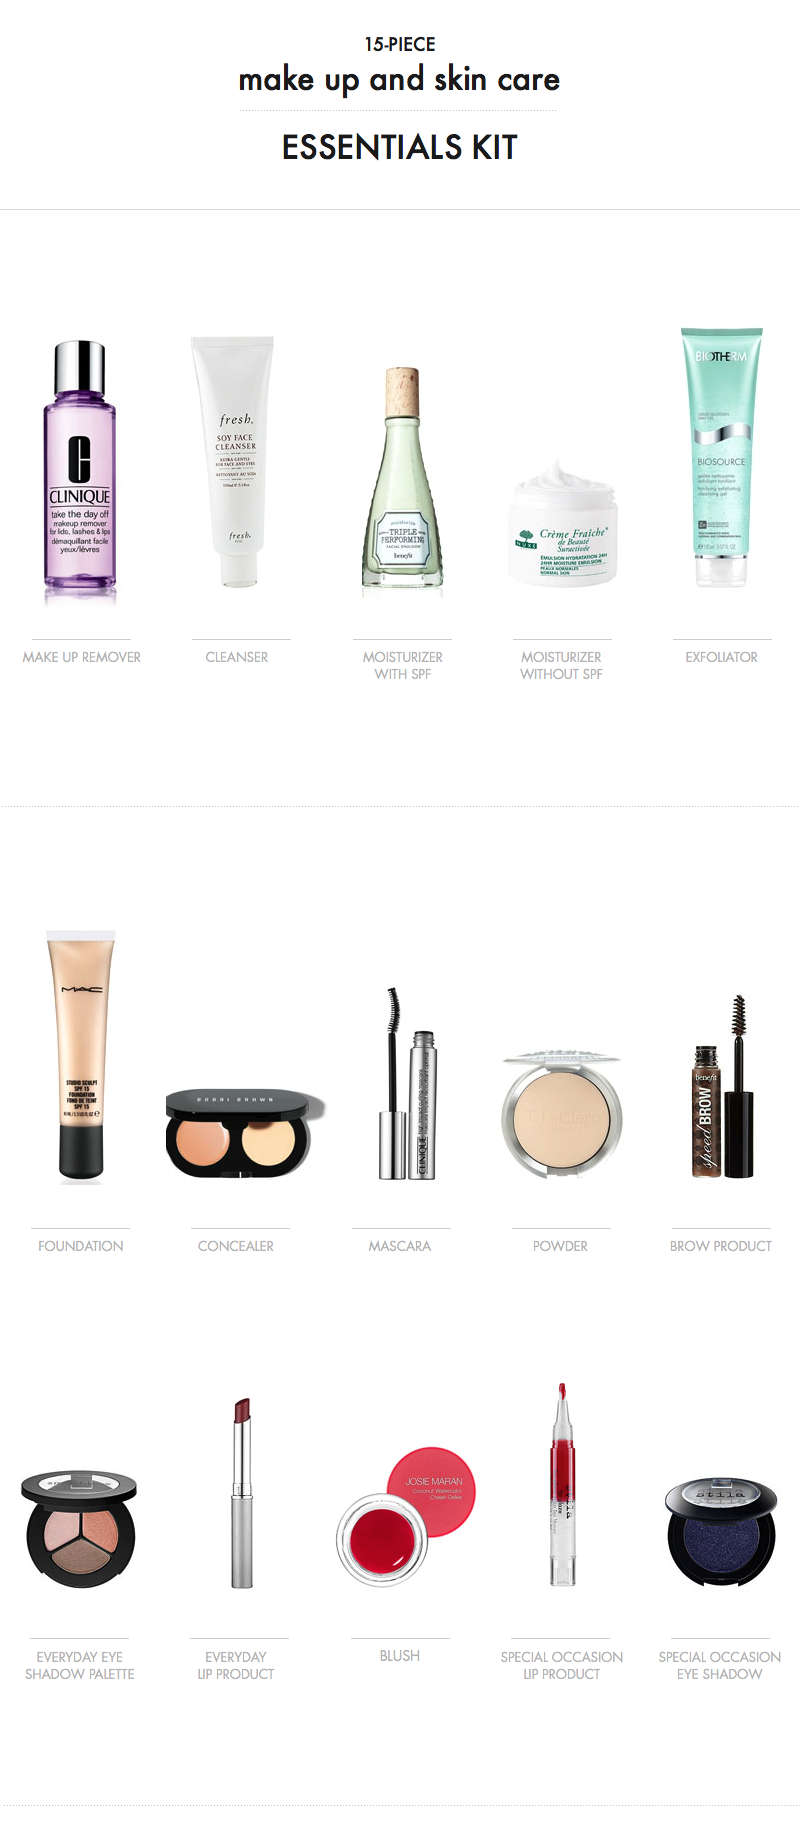 Better a build beauty routine using pinterest